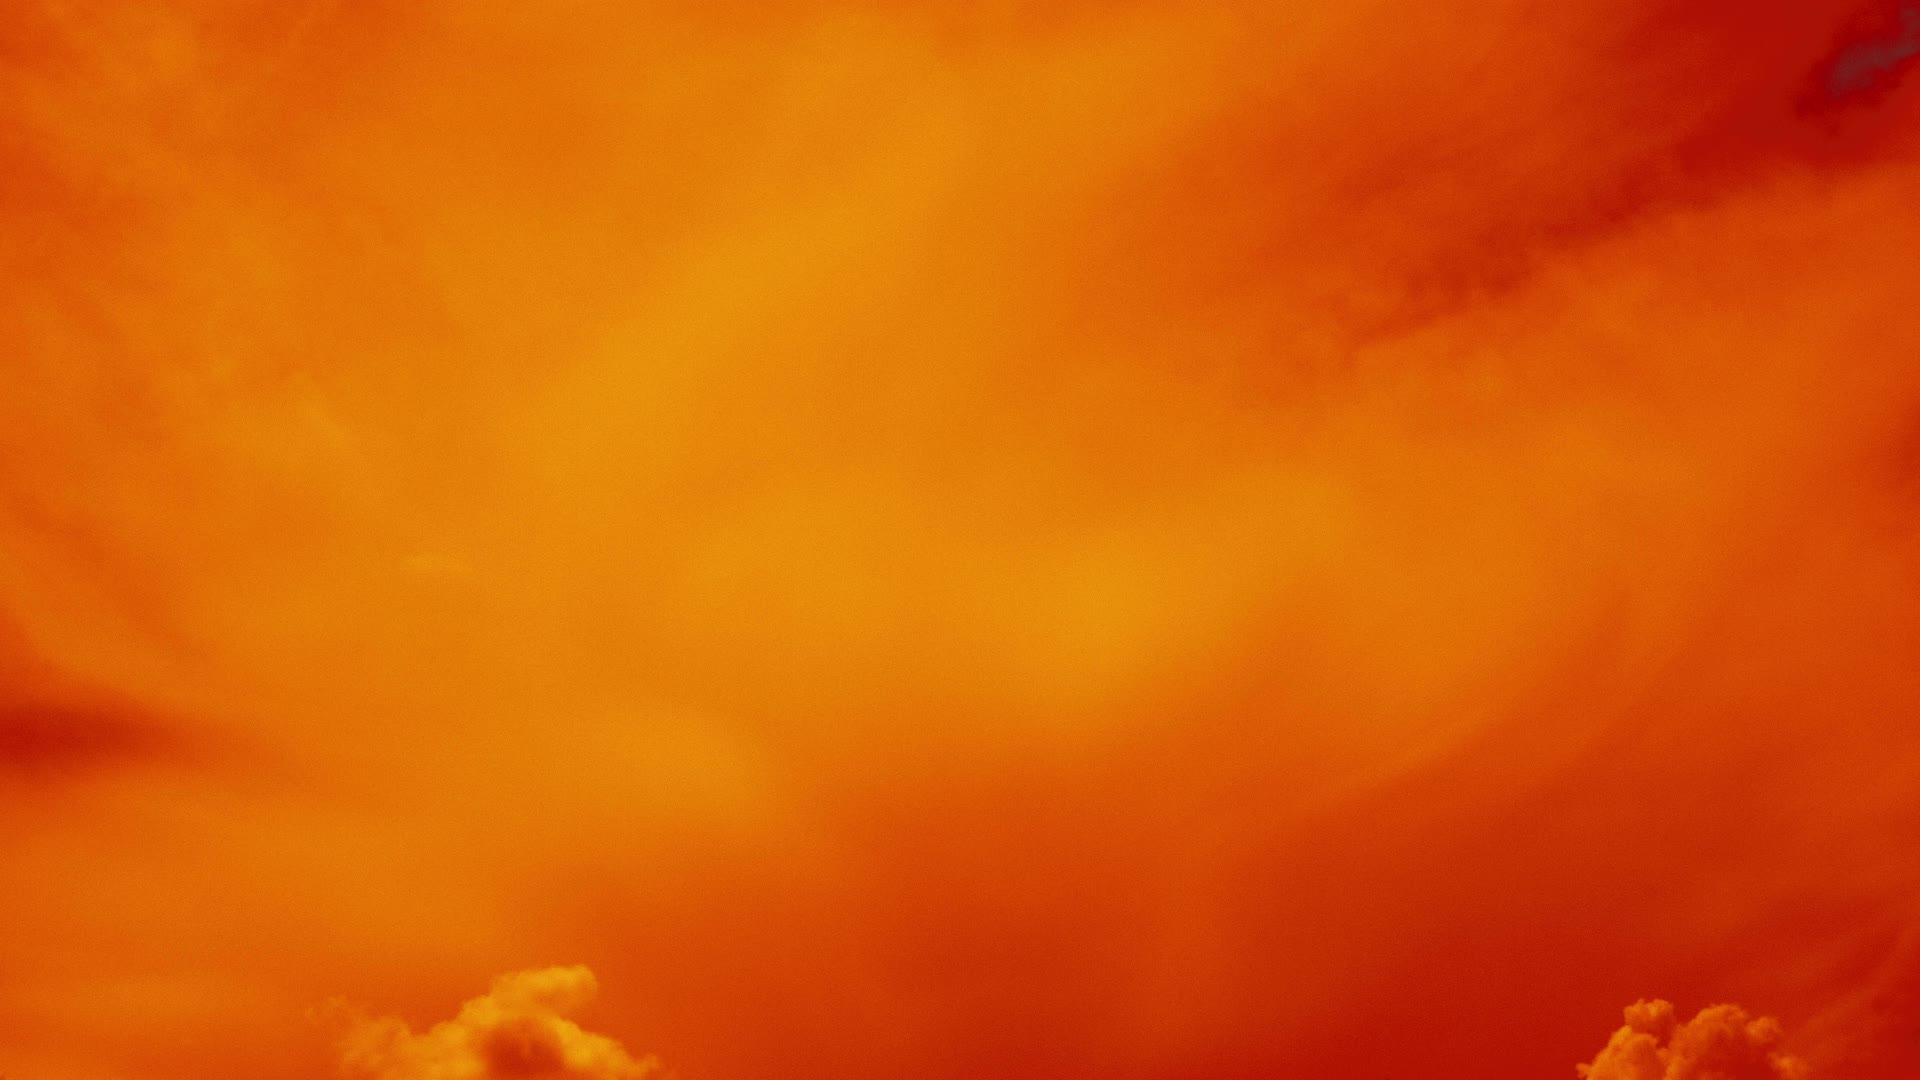 Fondos Color Naranja HD